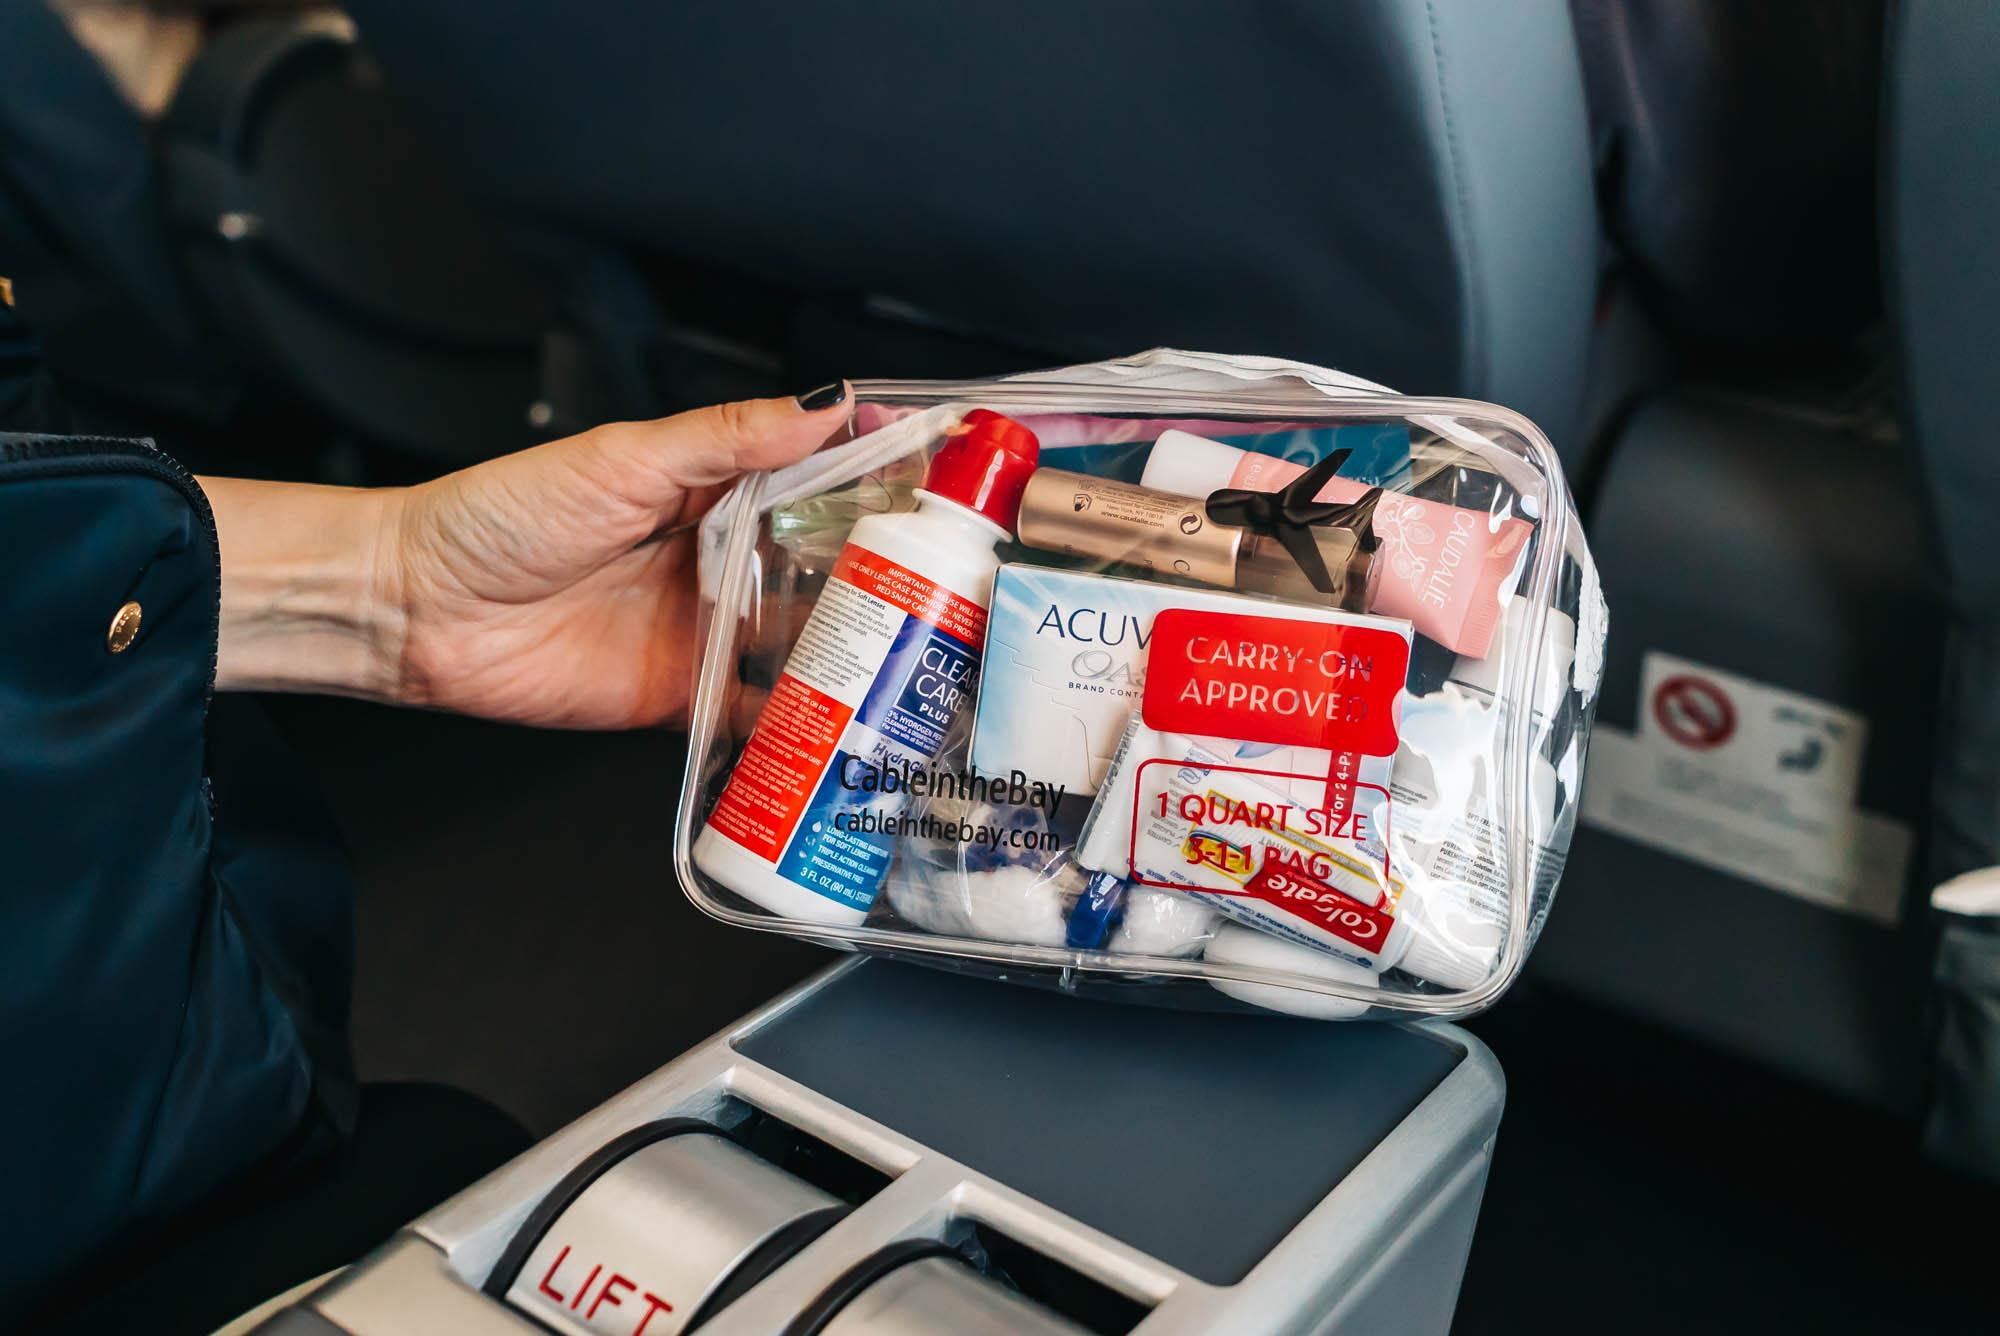 TSA Approved 1 Quart Sized Bag